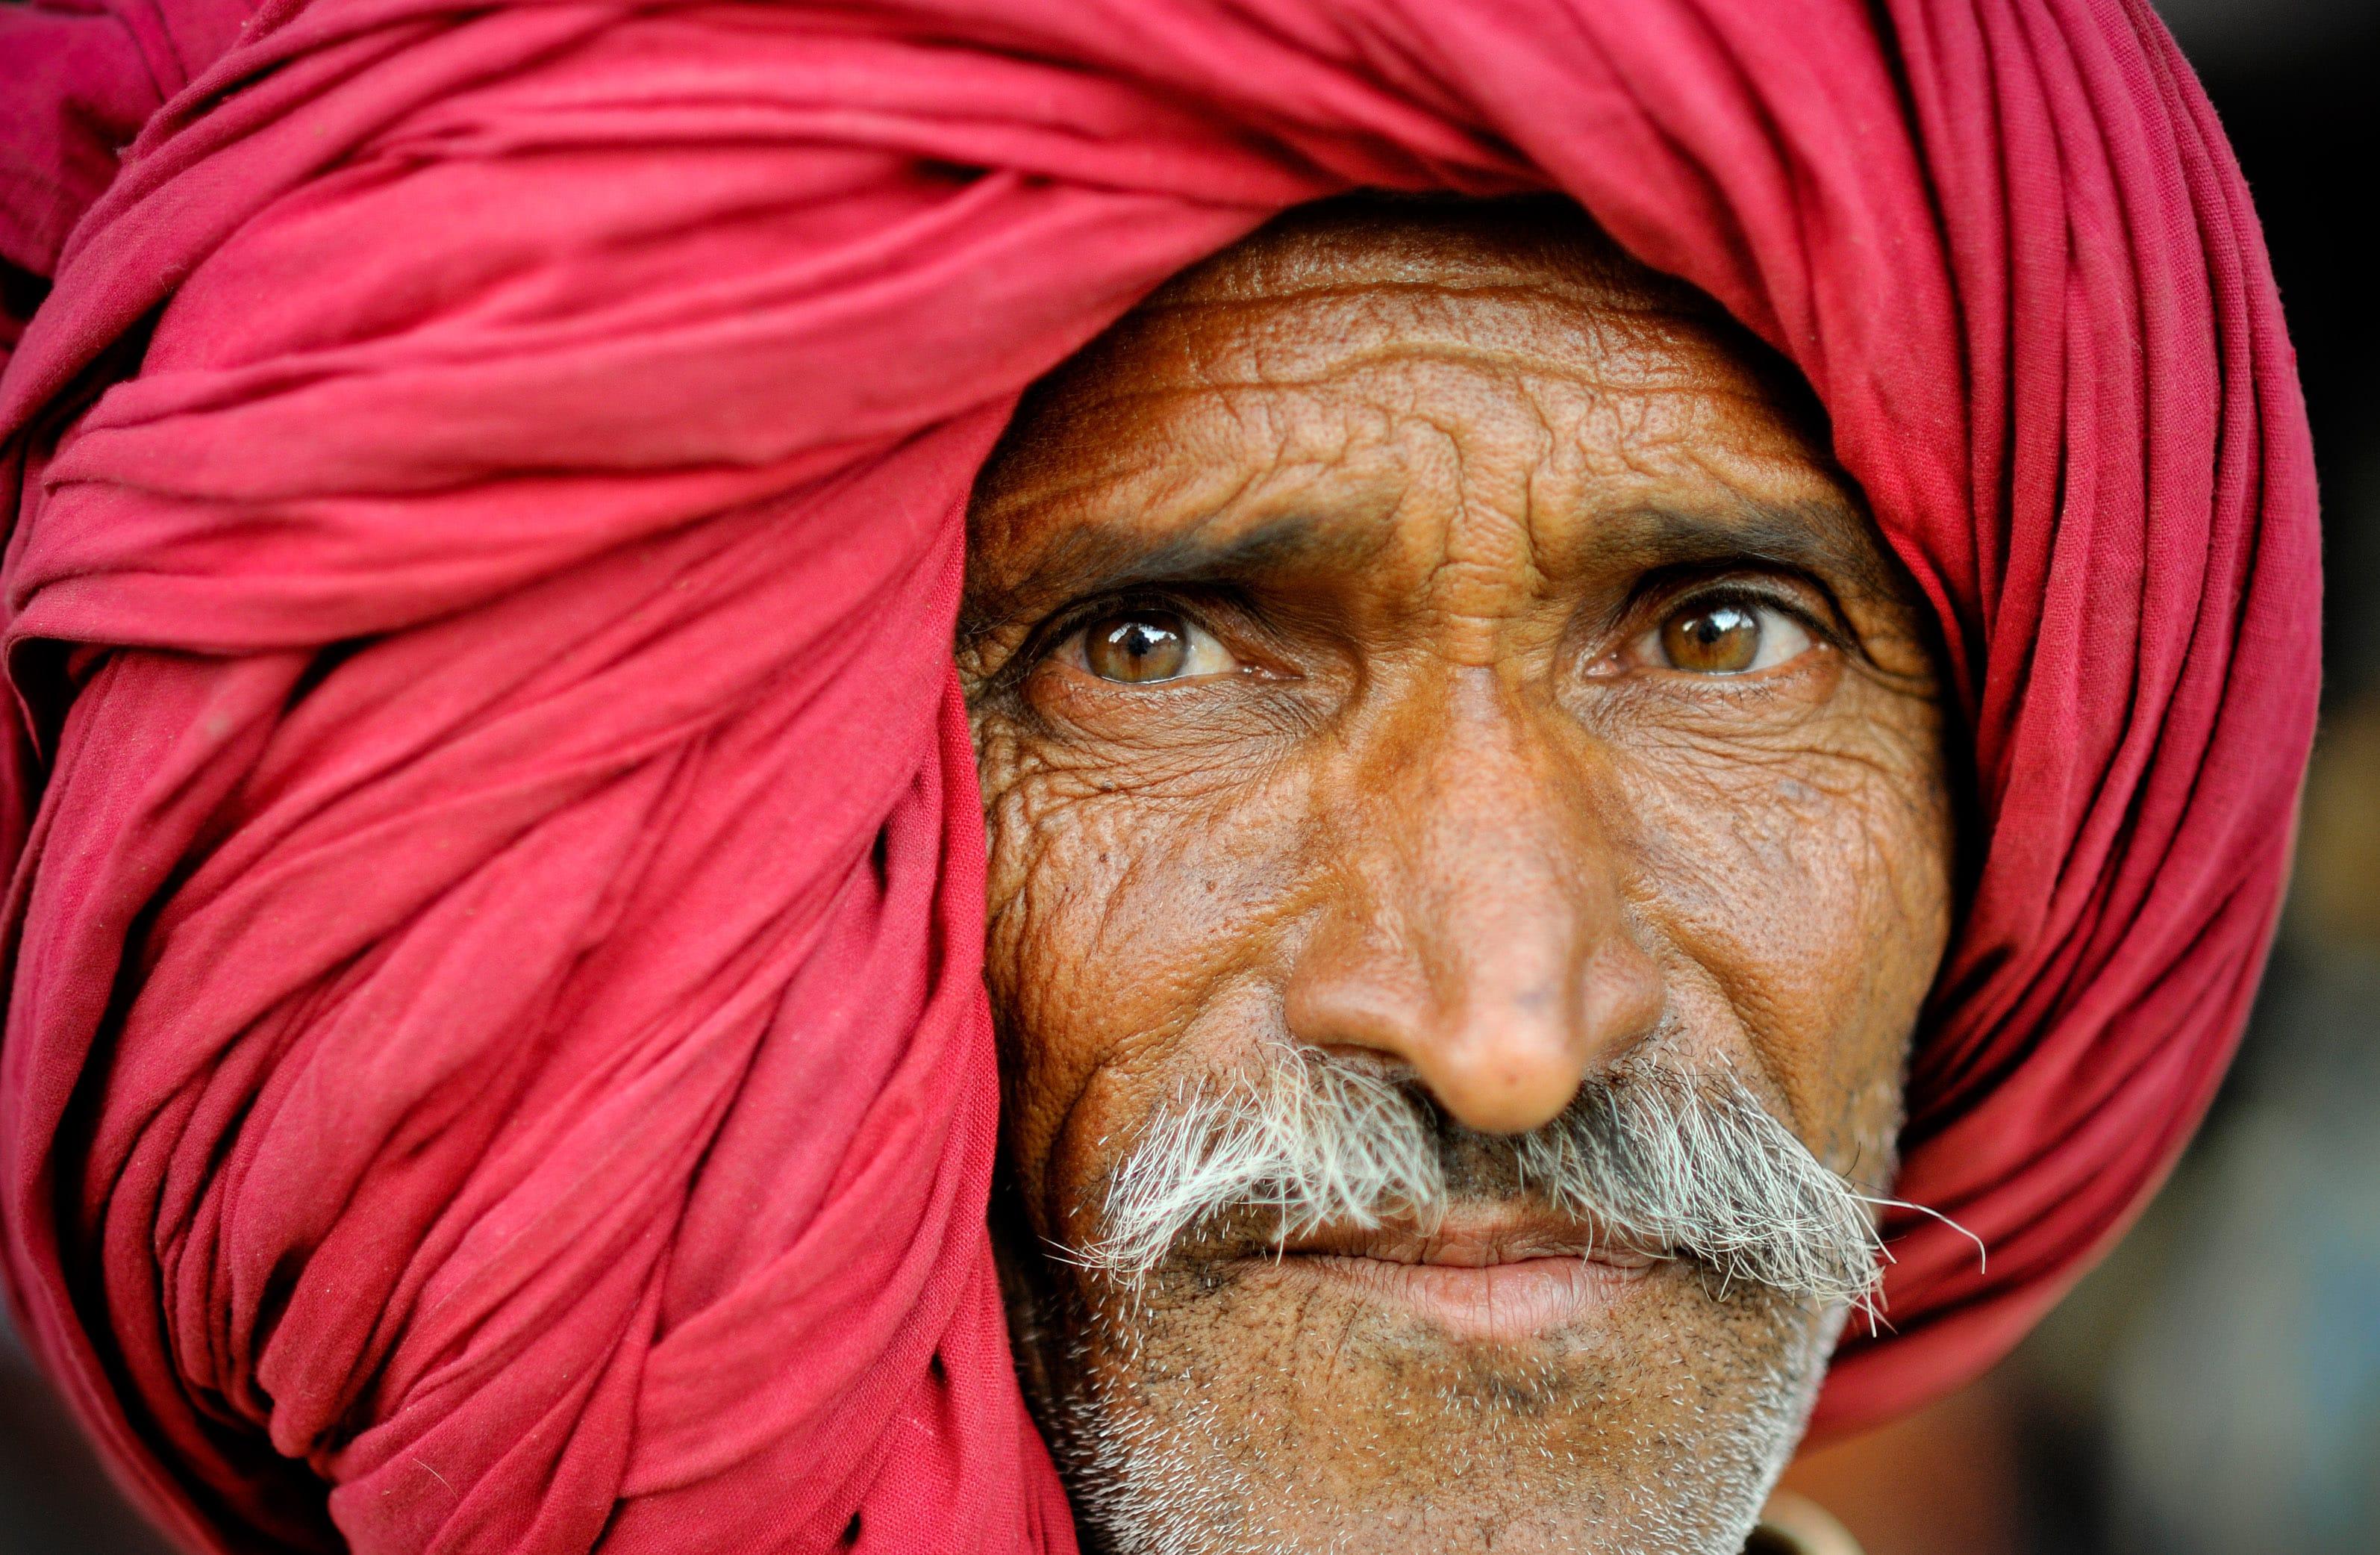 indien_madhyaPradesh_foto_olaf_krueger